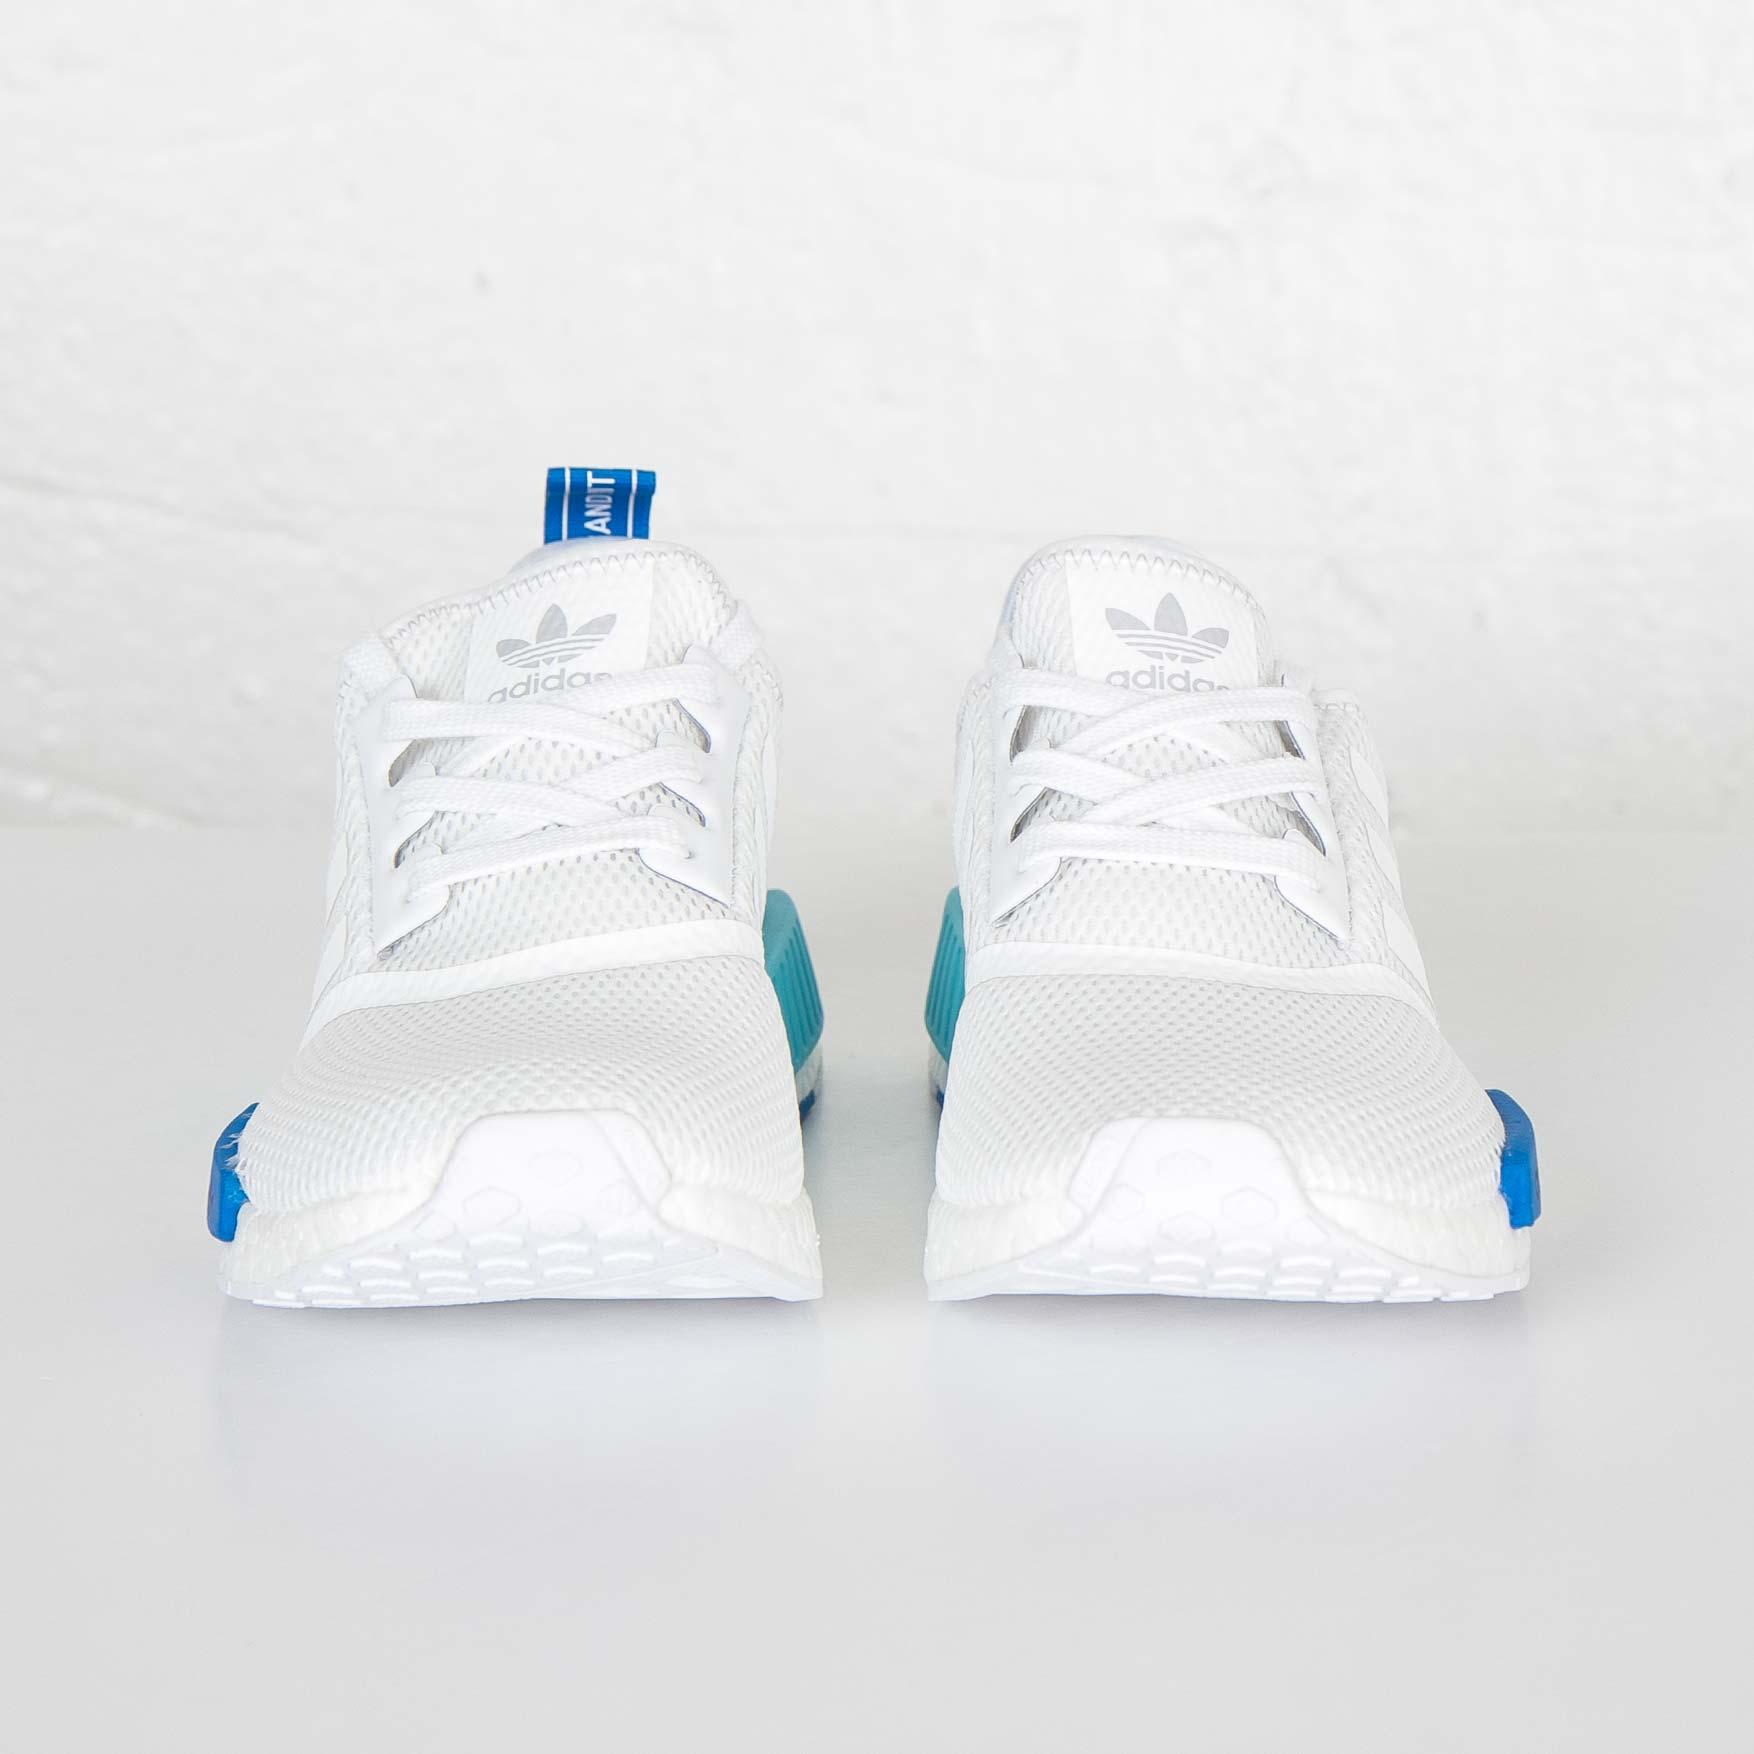 6a6f583099a9b adidas NMD R1 W - S75235 - Sneakersnstuff